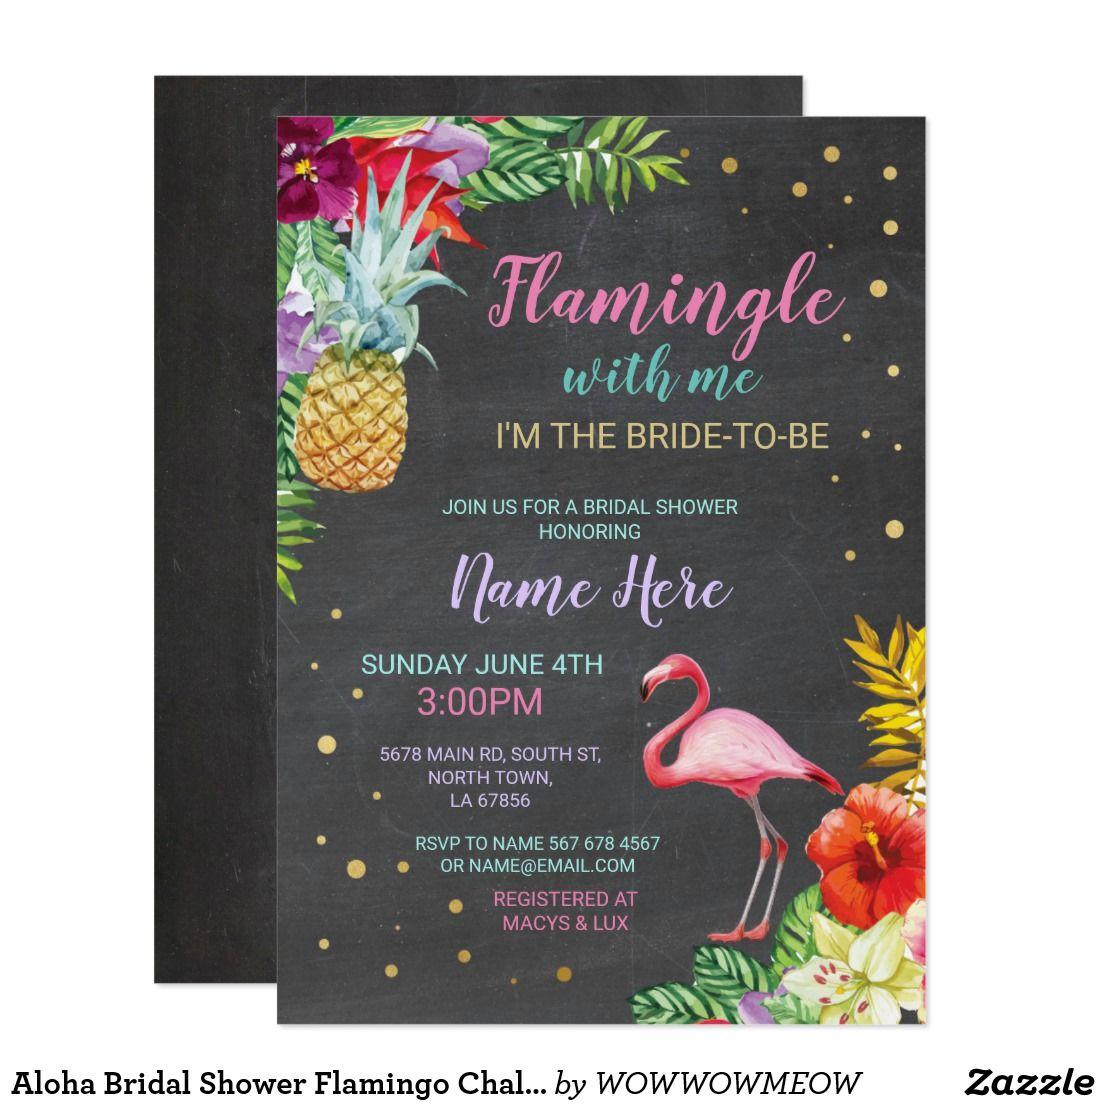 aloha bridal shower flamingo chalk gold invite zazzle com aloha bridal shower tropical baby shower invitations 40th birthday party invites pinterest